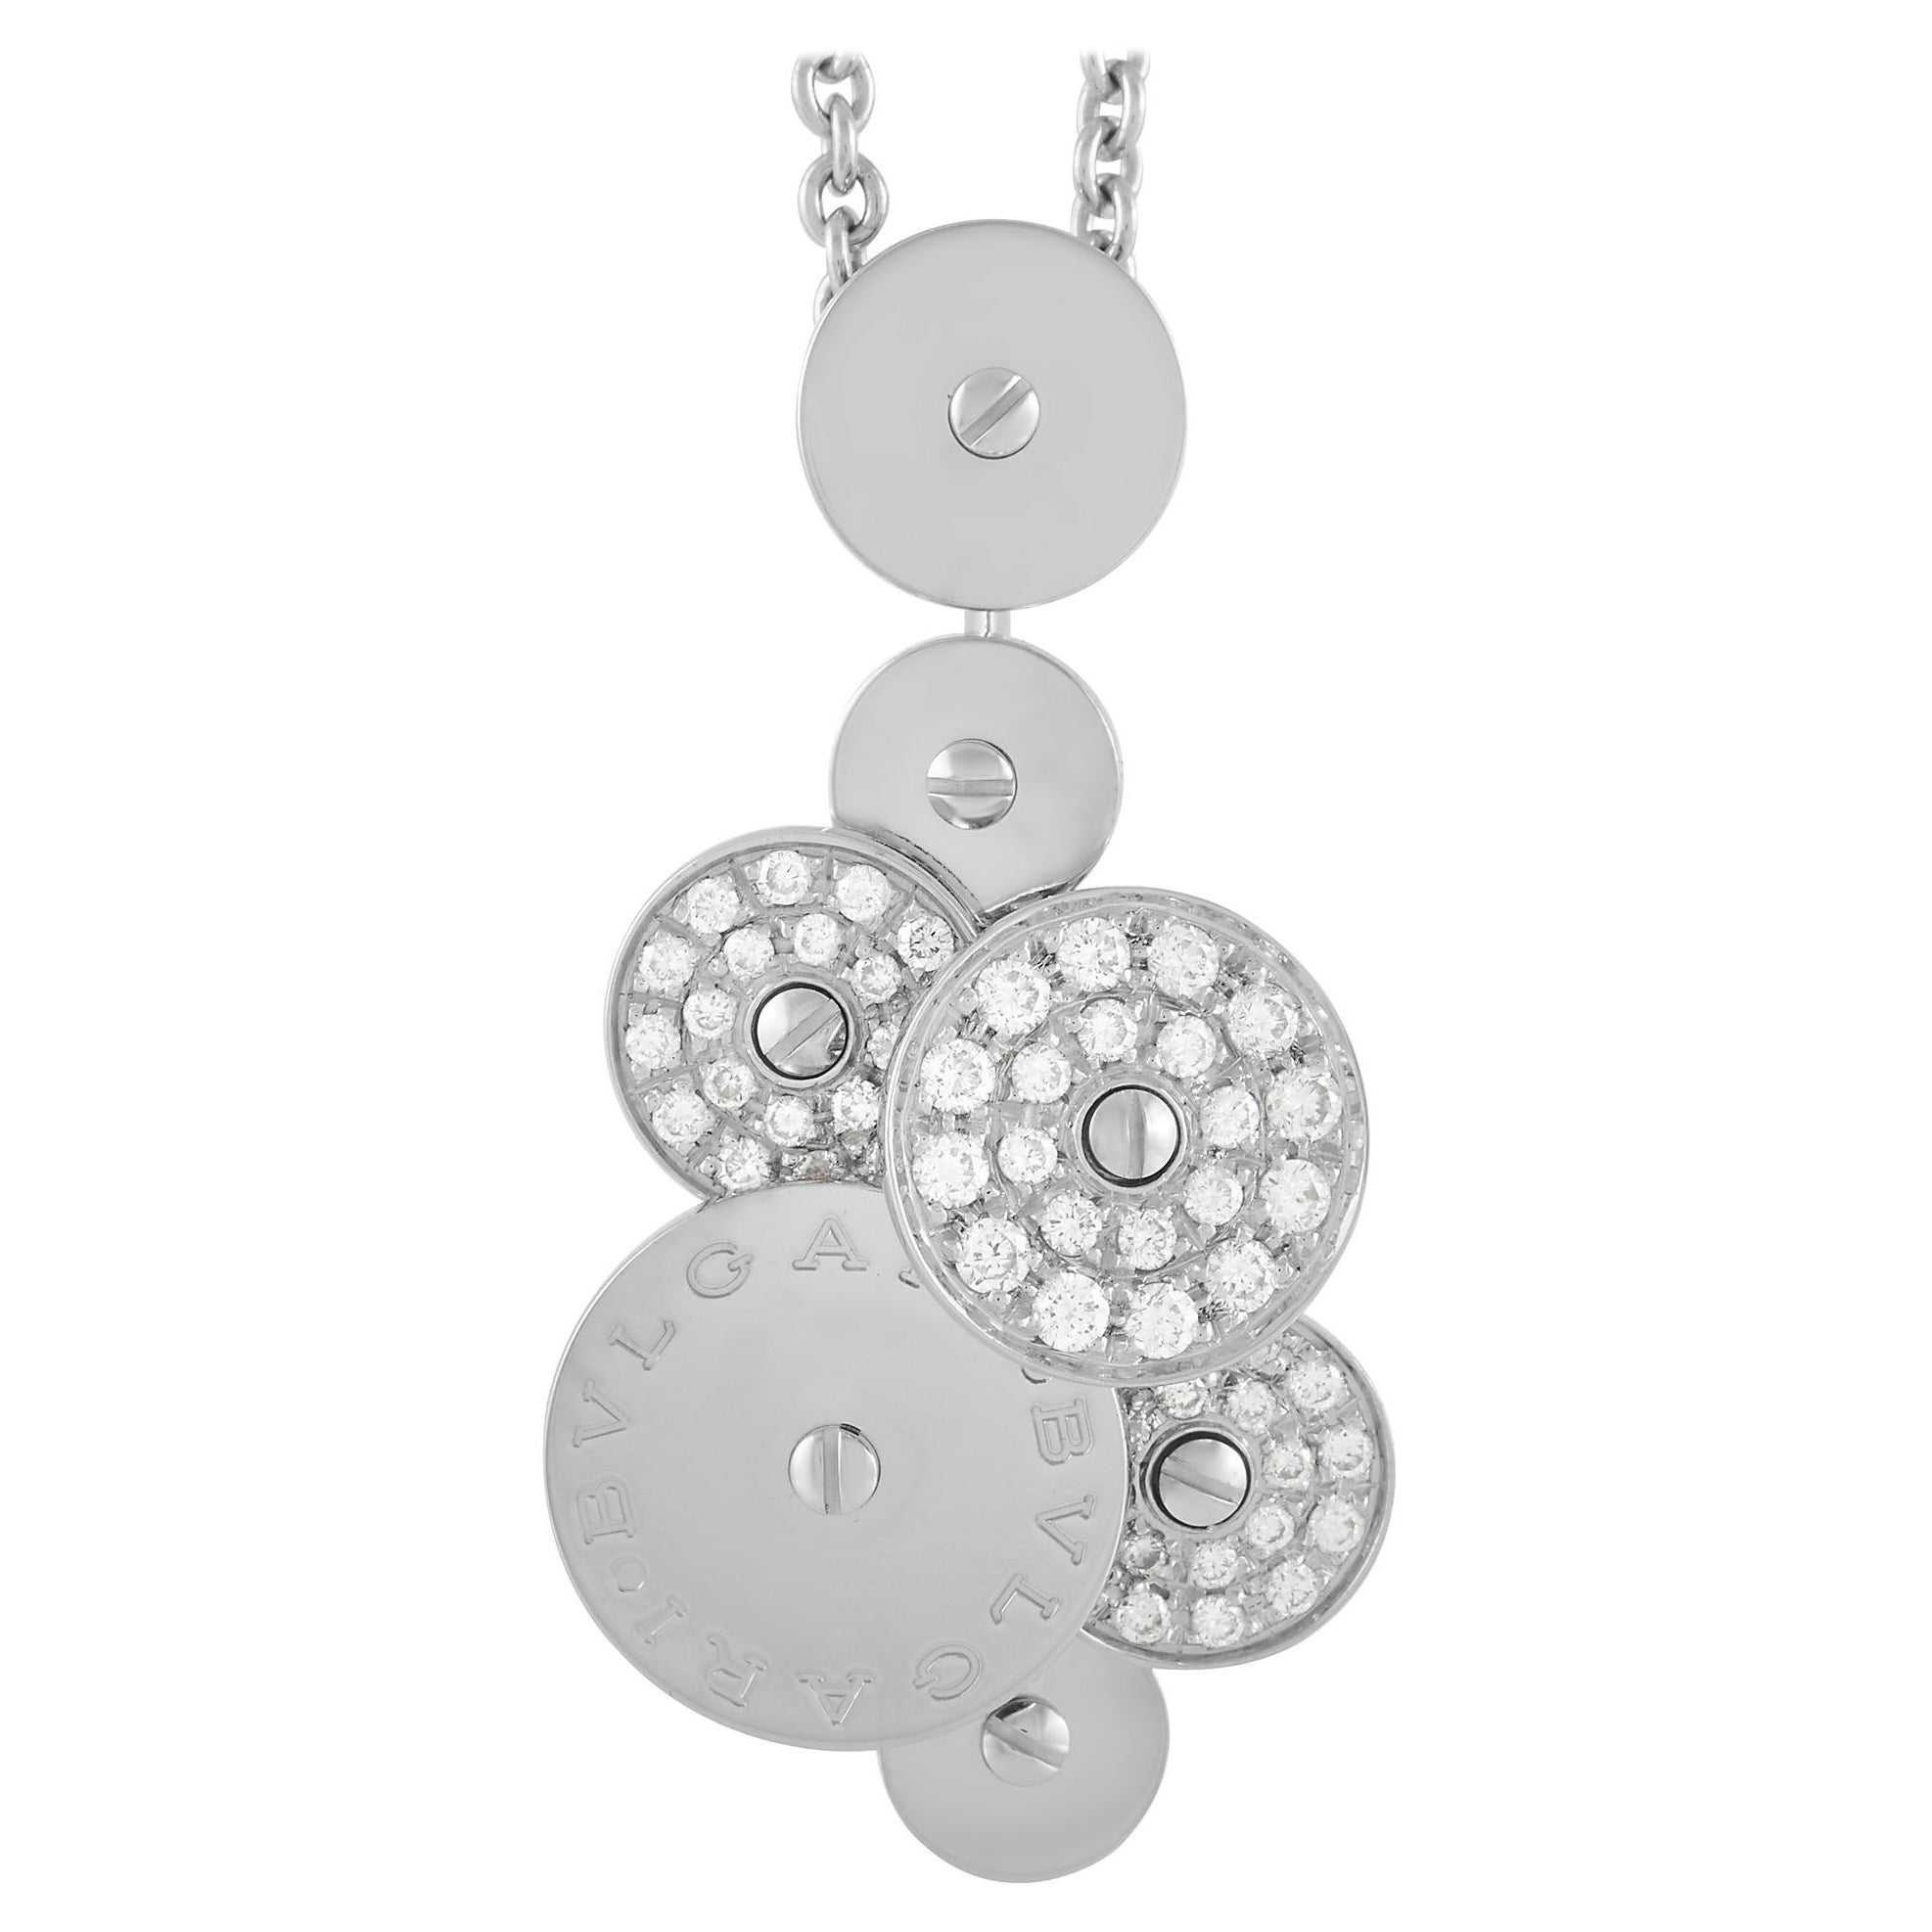 Bvlgari Cicladi 18K White Gold 0.50 Ct Diamond Pendant Necklace